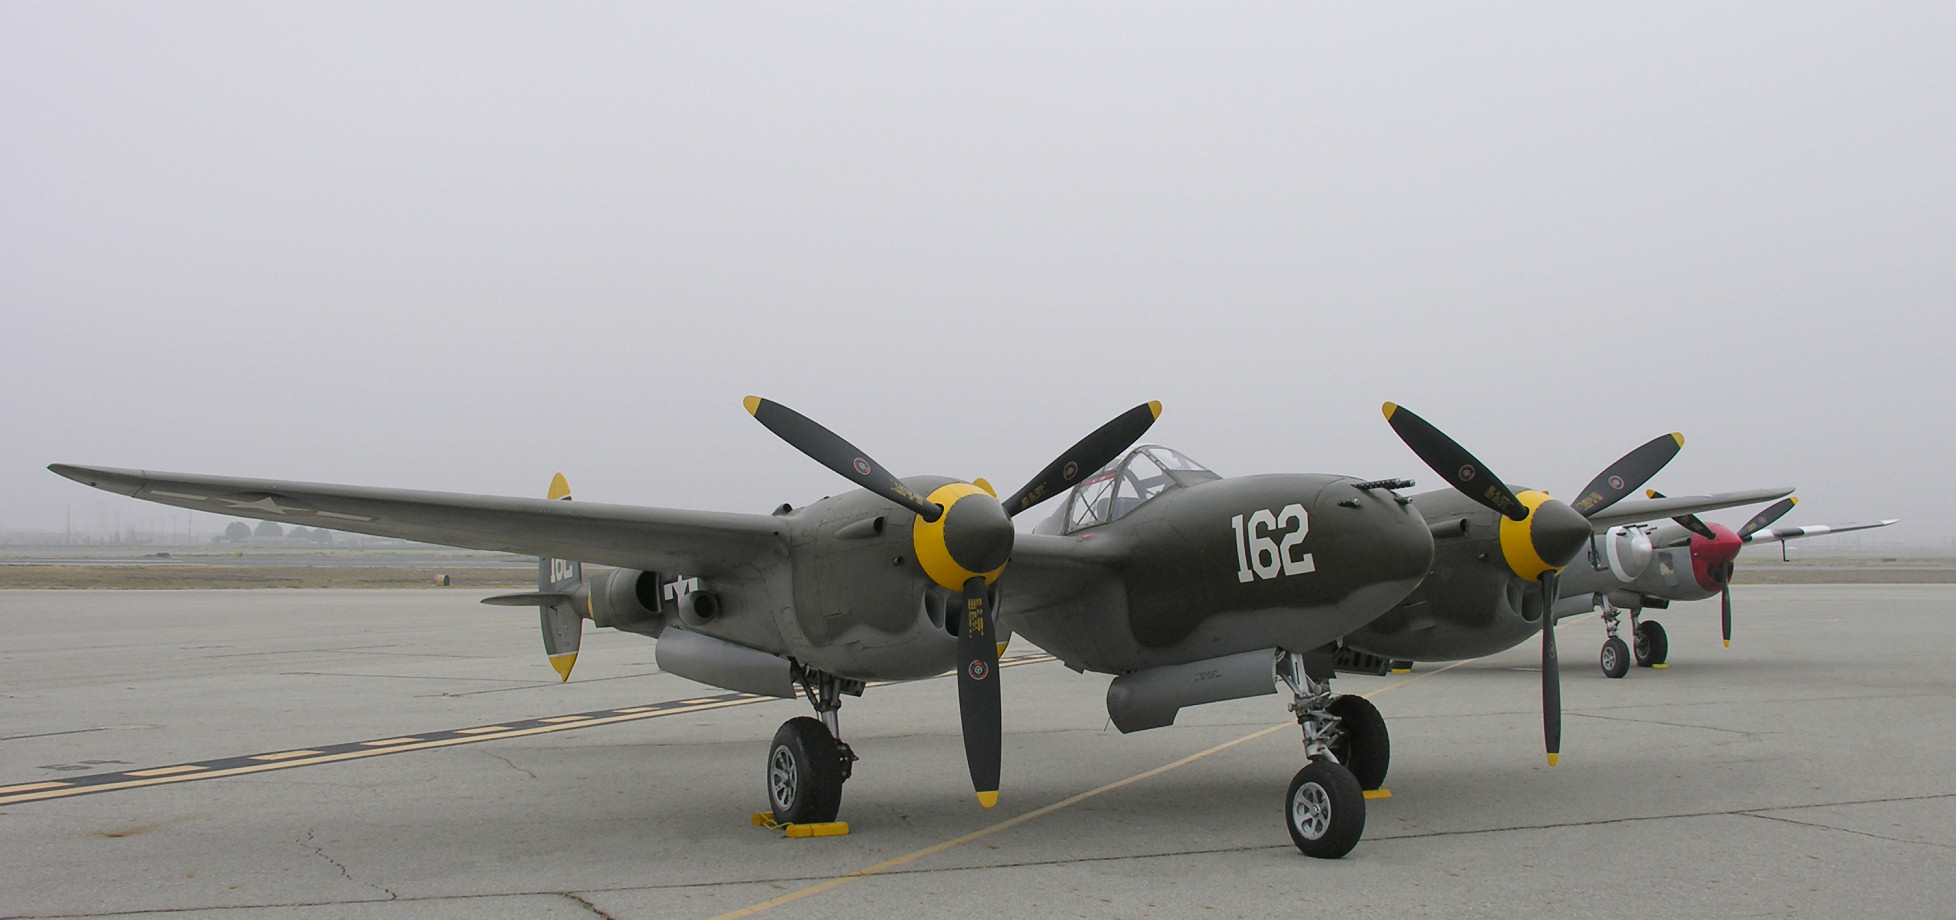 Lockheed P 38 Lightning Wikipedia Autos Post